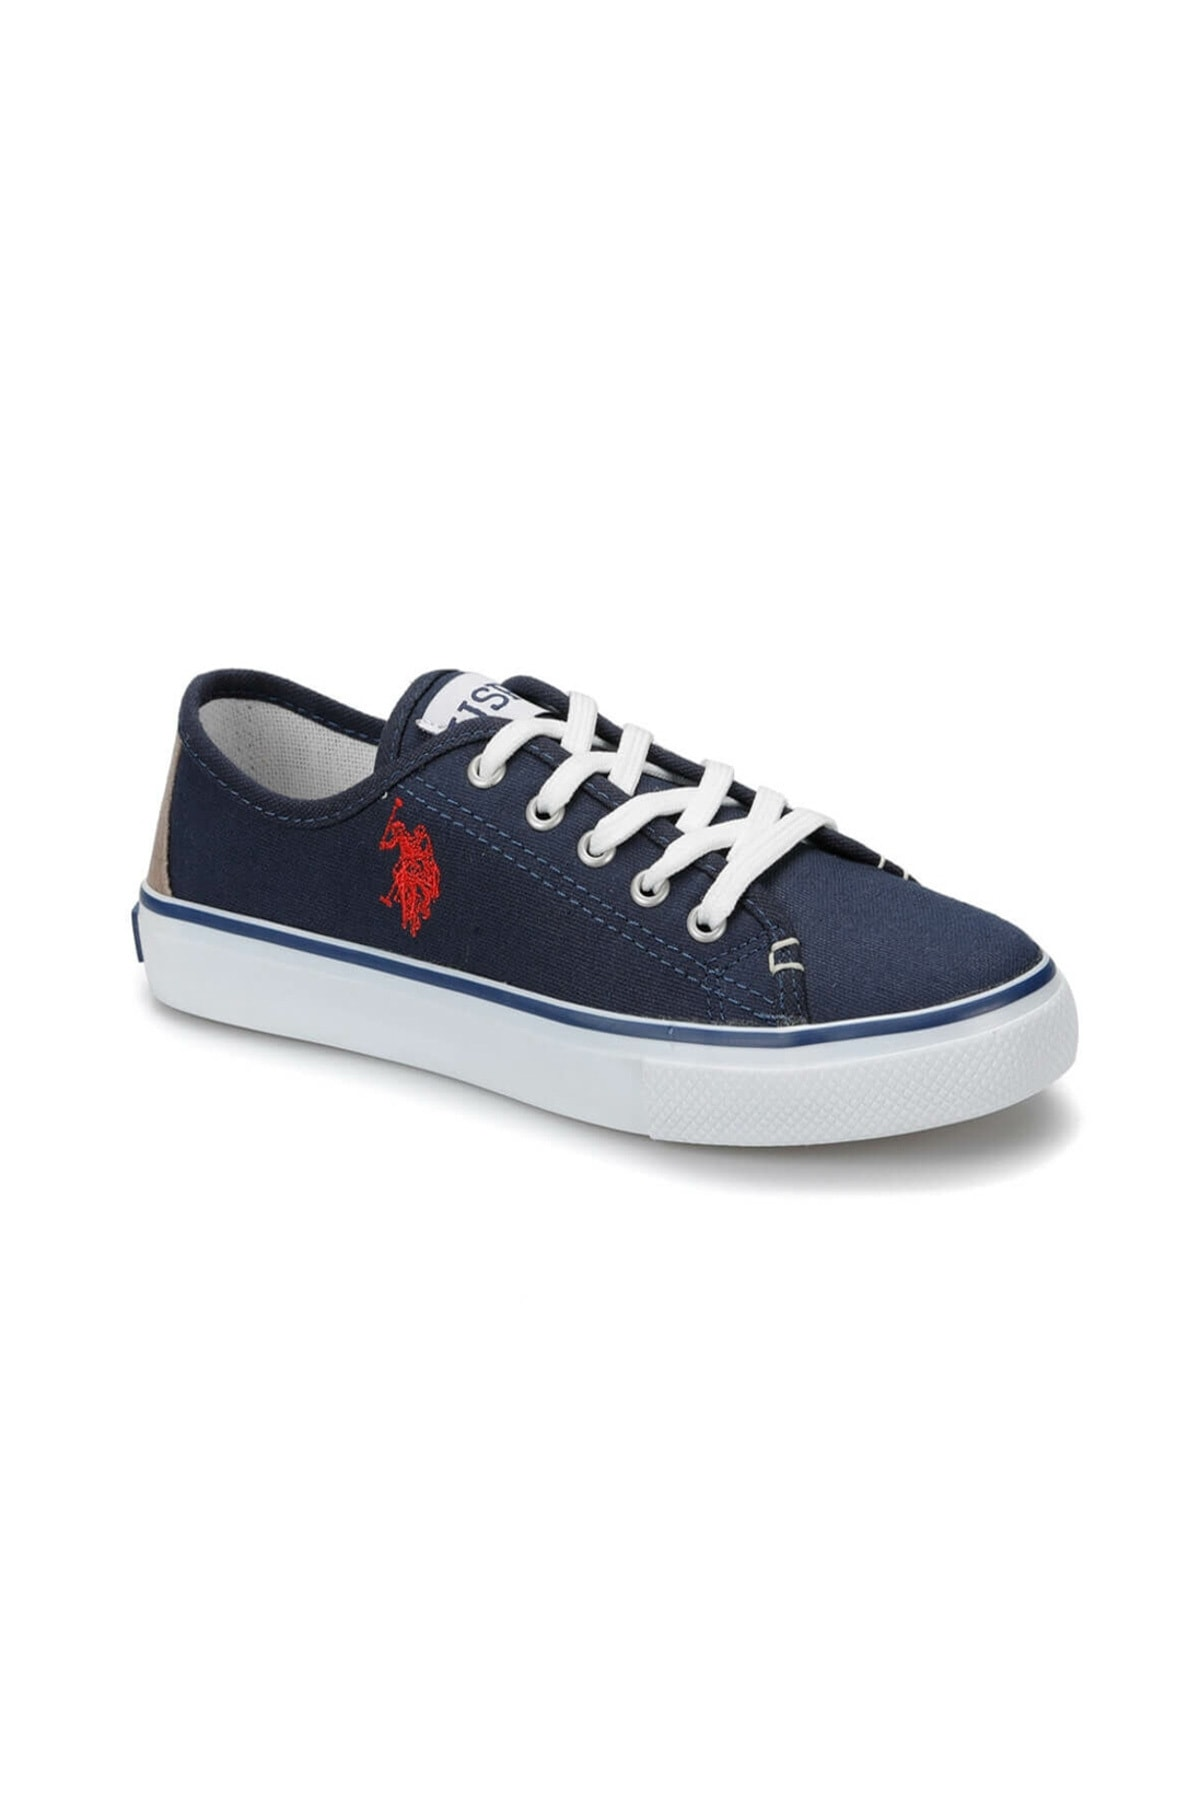 U.S. Polo Assn. Ayakkabı 1